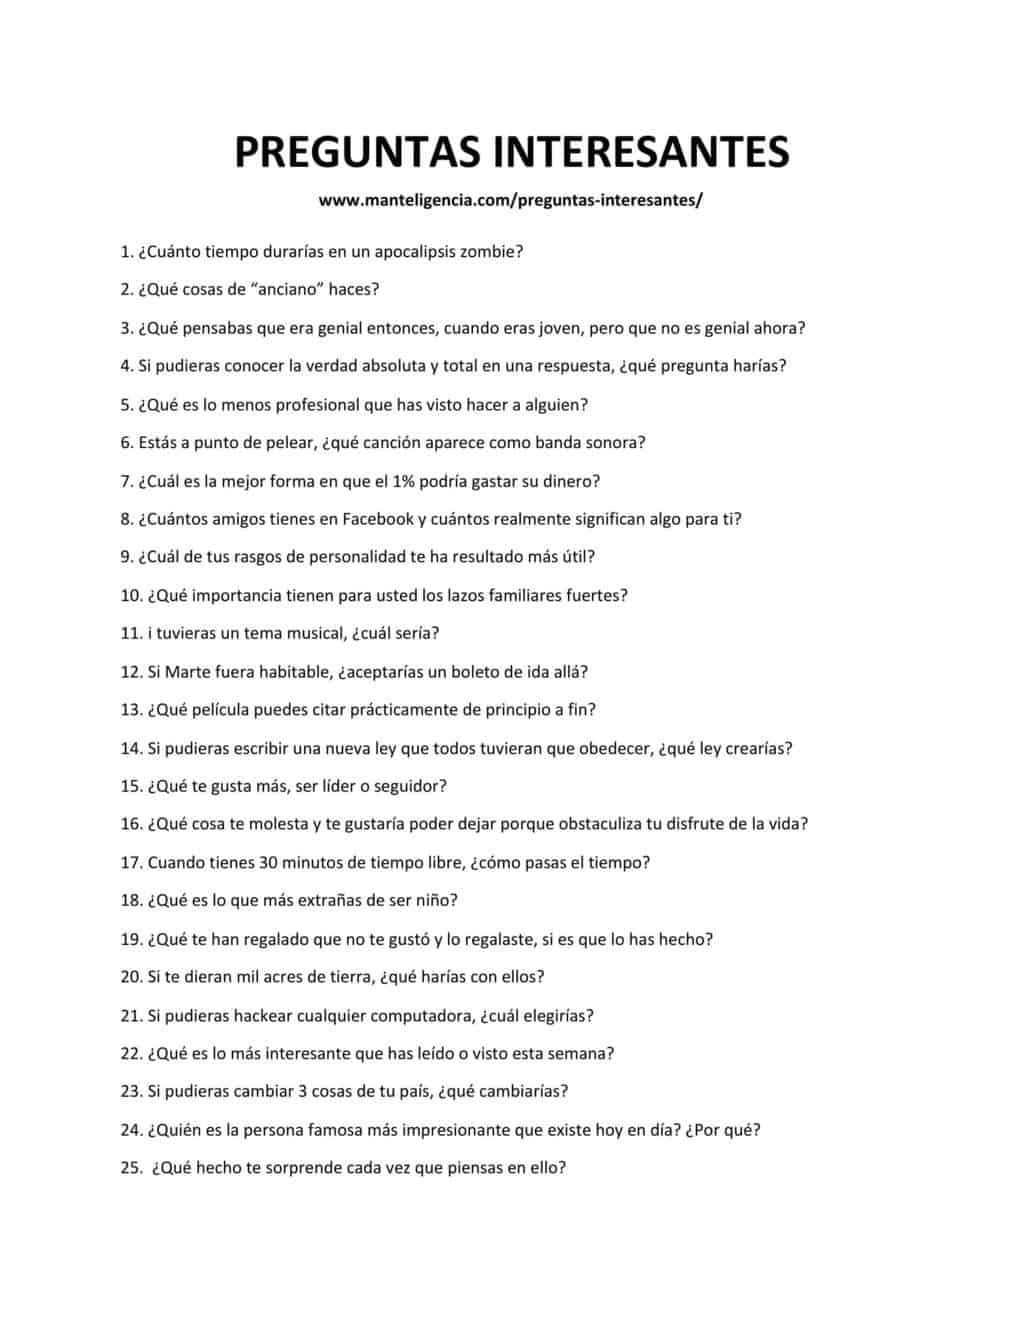 PREGUNTAS INTERESANTES-1